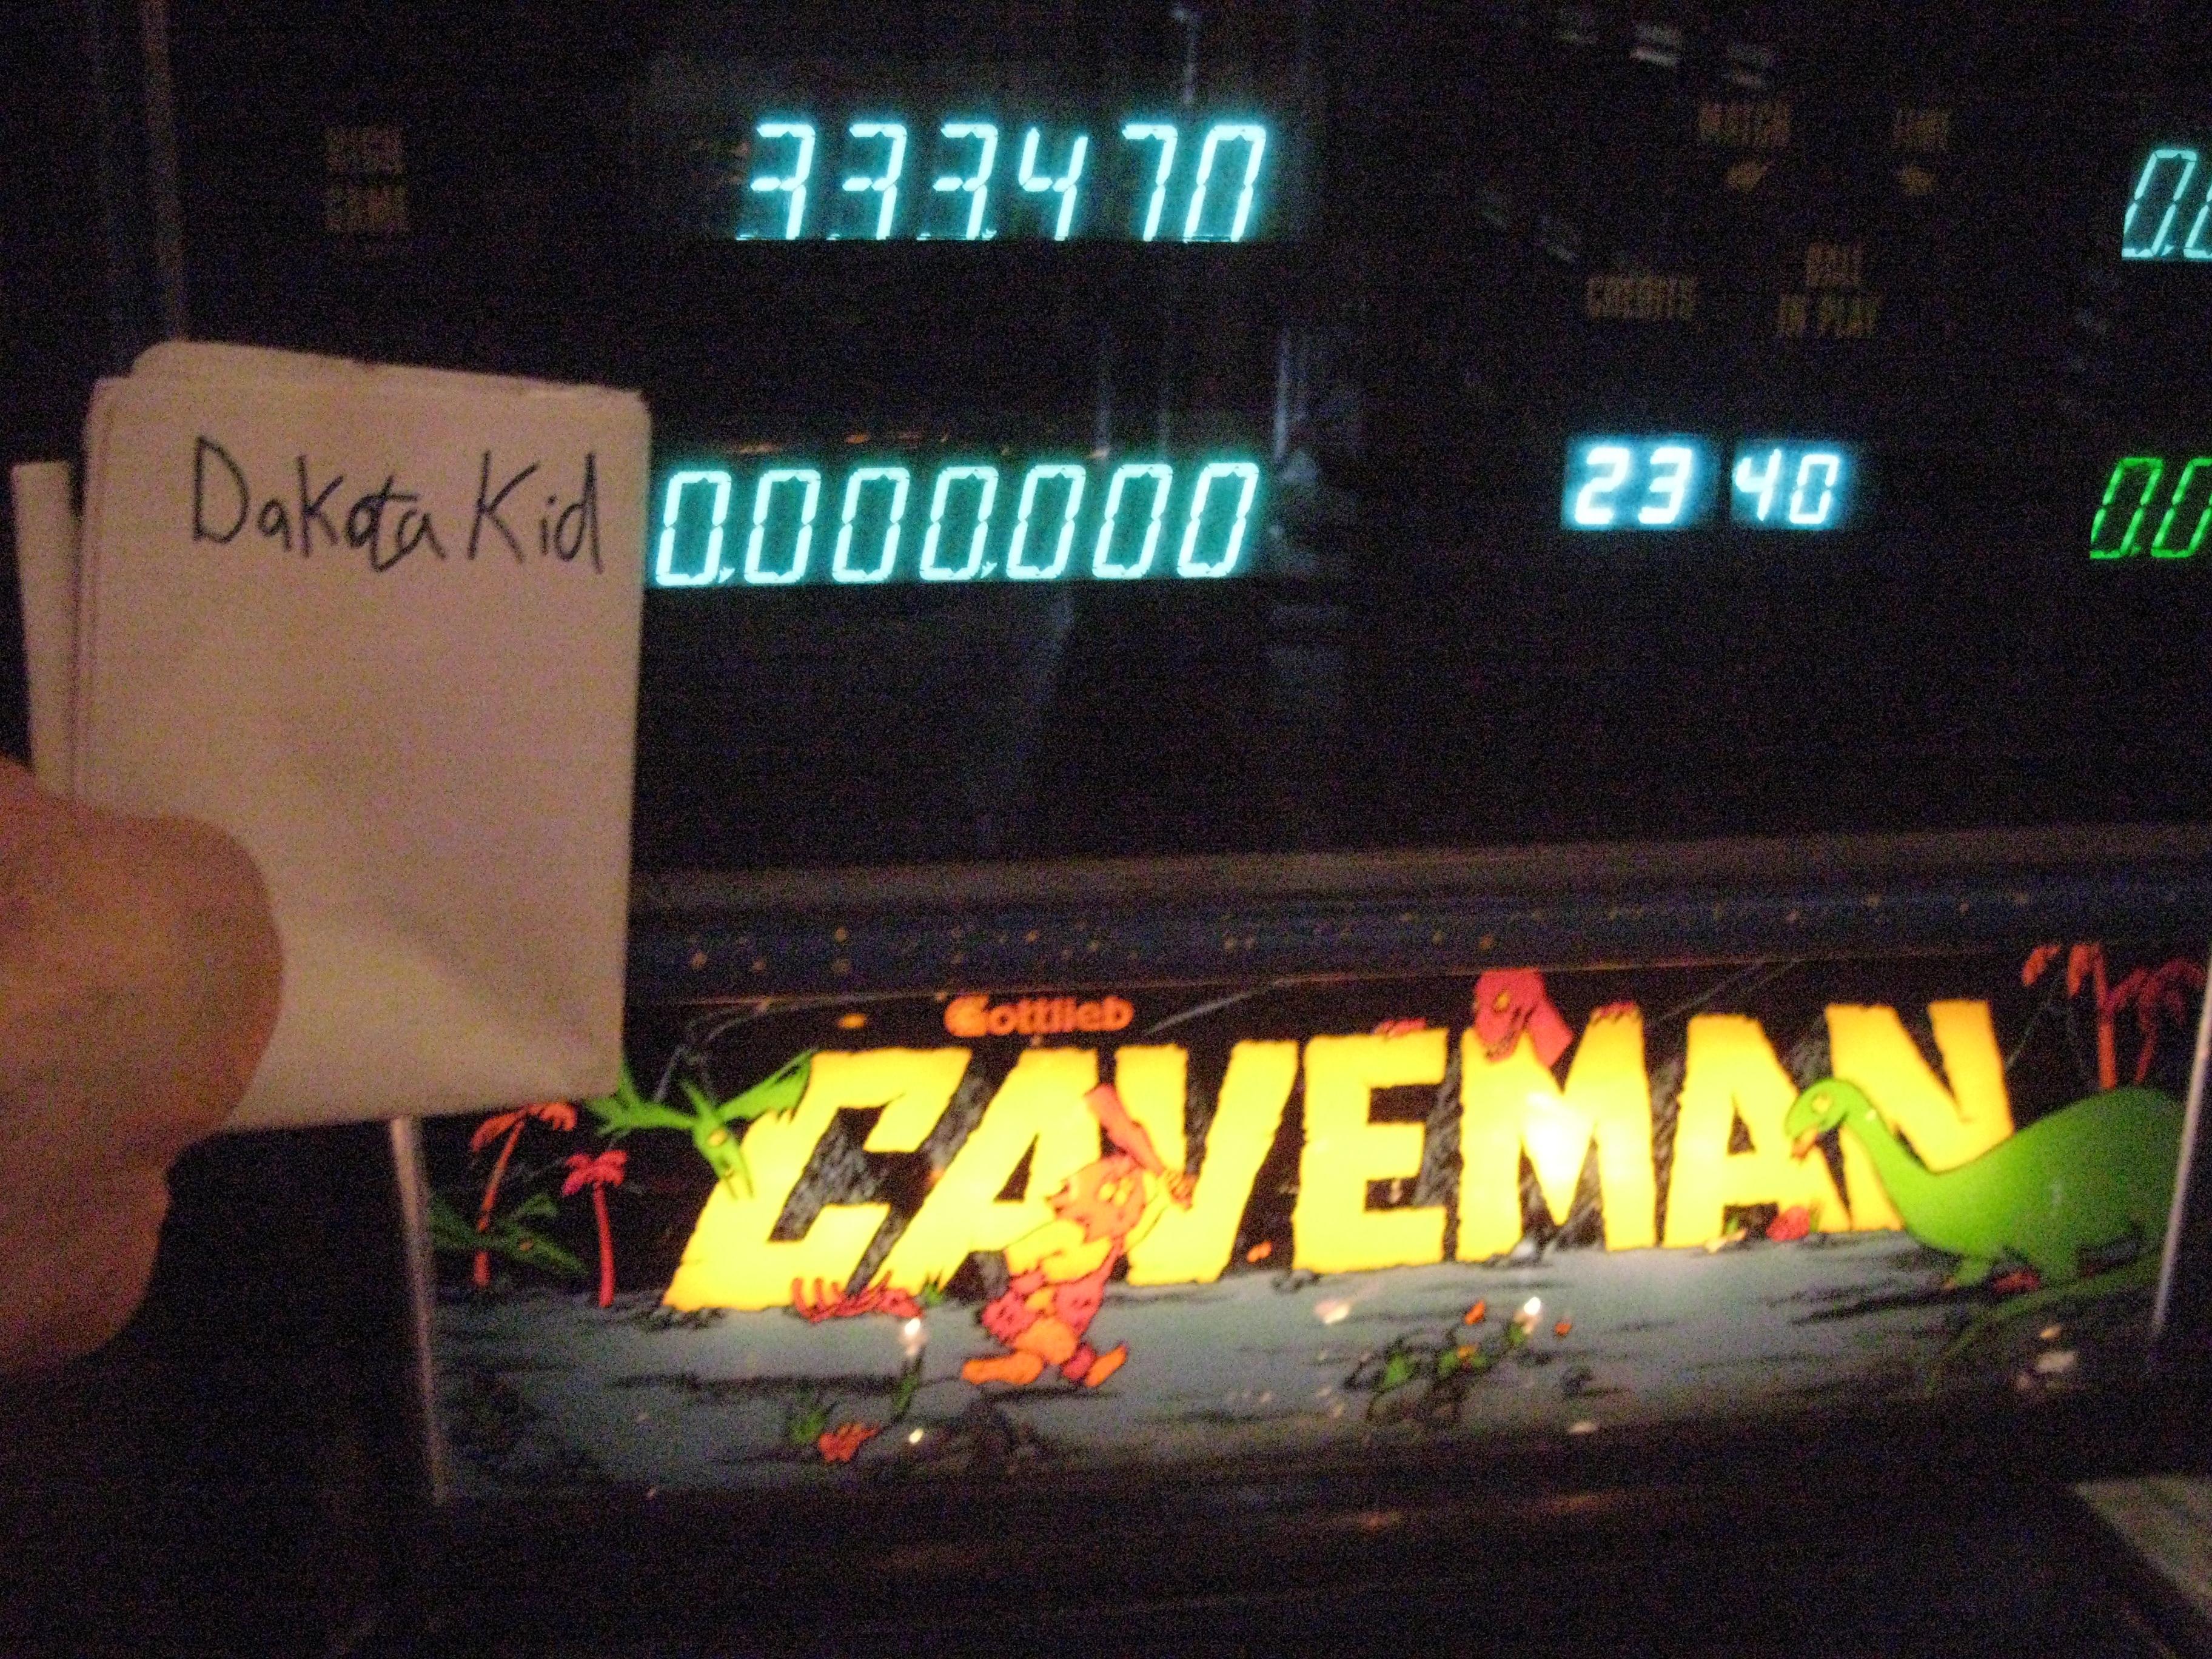 Caveman 333,470 points